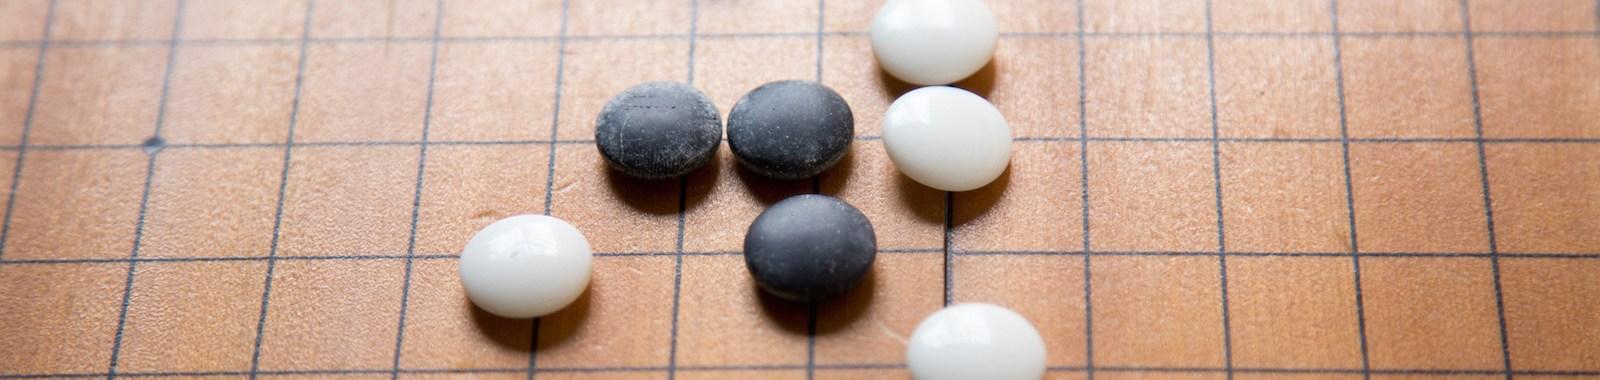 Baduk; Go game black and white stone